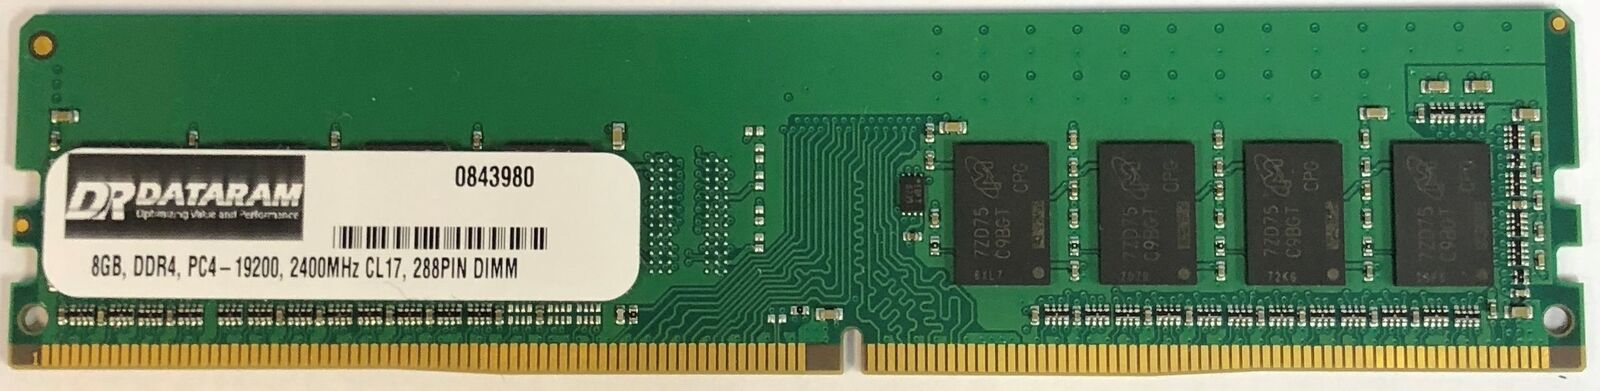 4GB DIMM Gigabyte GA-B85-HD3 GA-B85M-D3H GA-B85M-HD3 GA-E240N Ram Memory